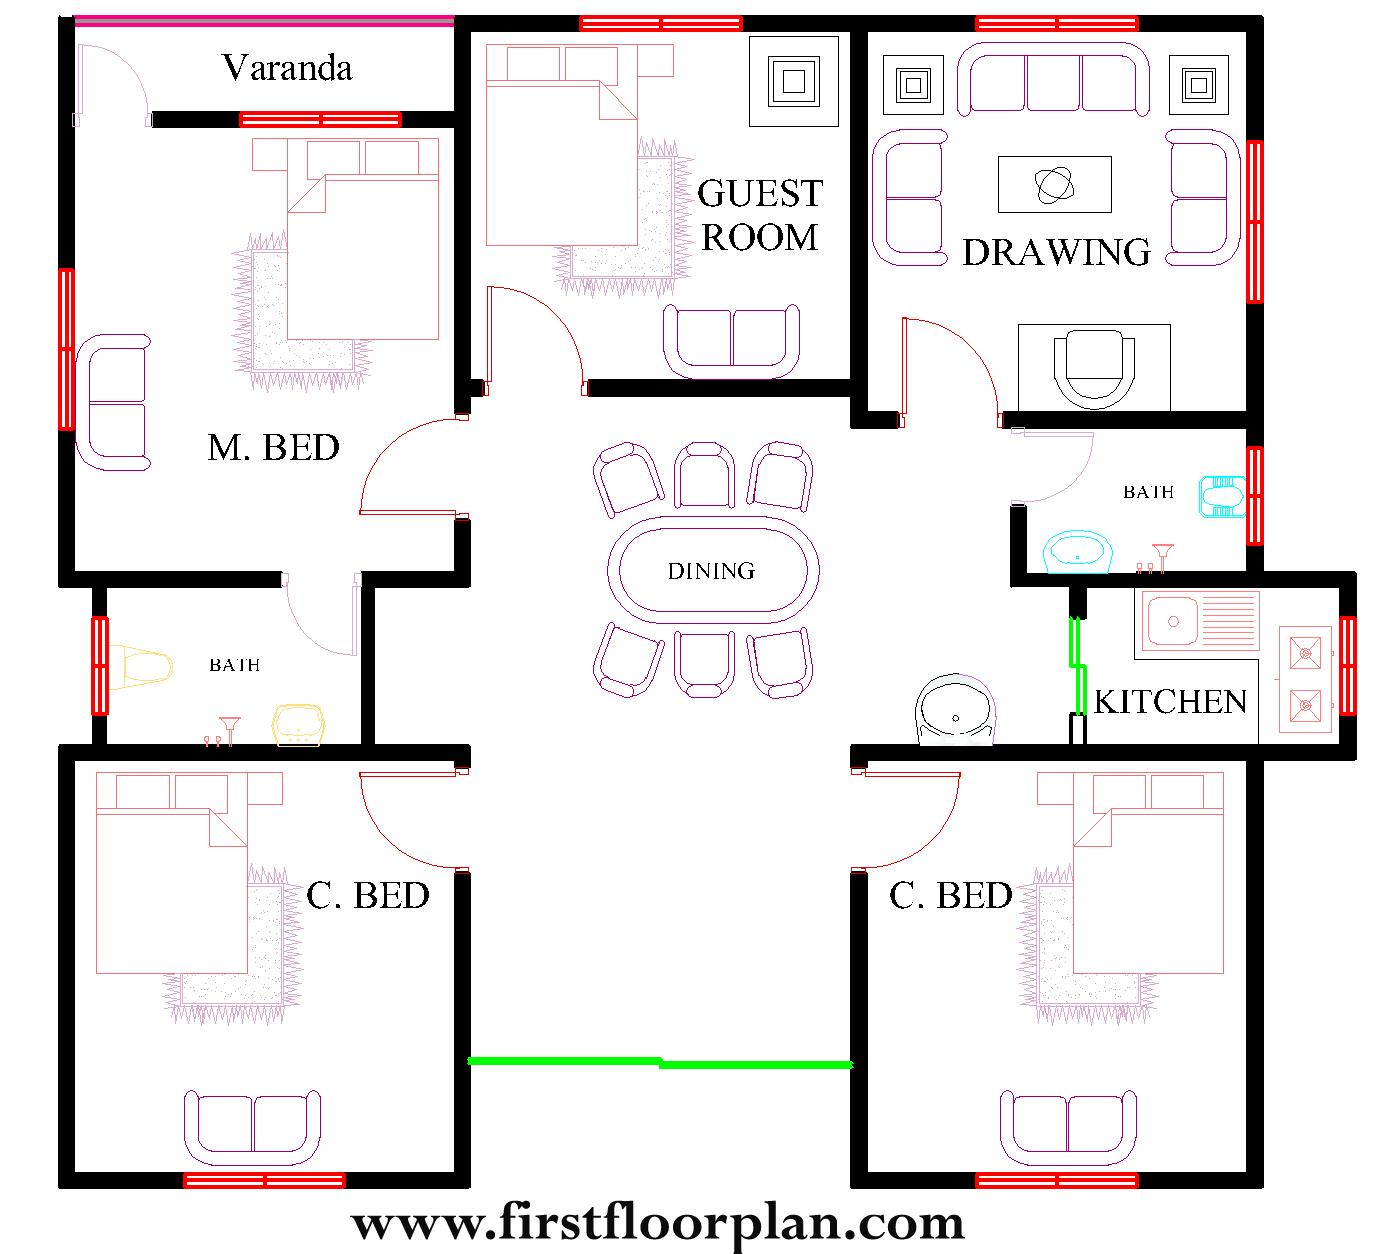 40x30 house plans, 40x30 Autocad floor plan